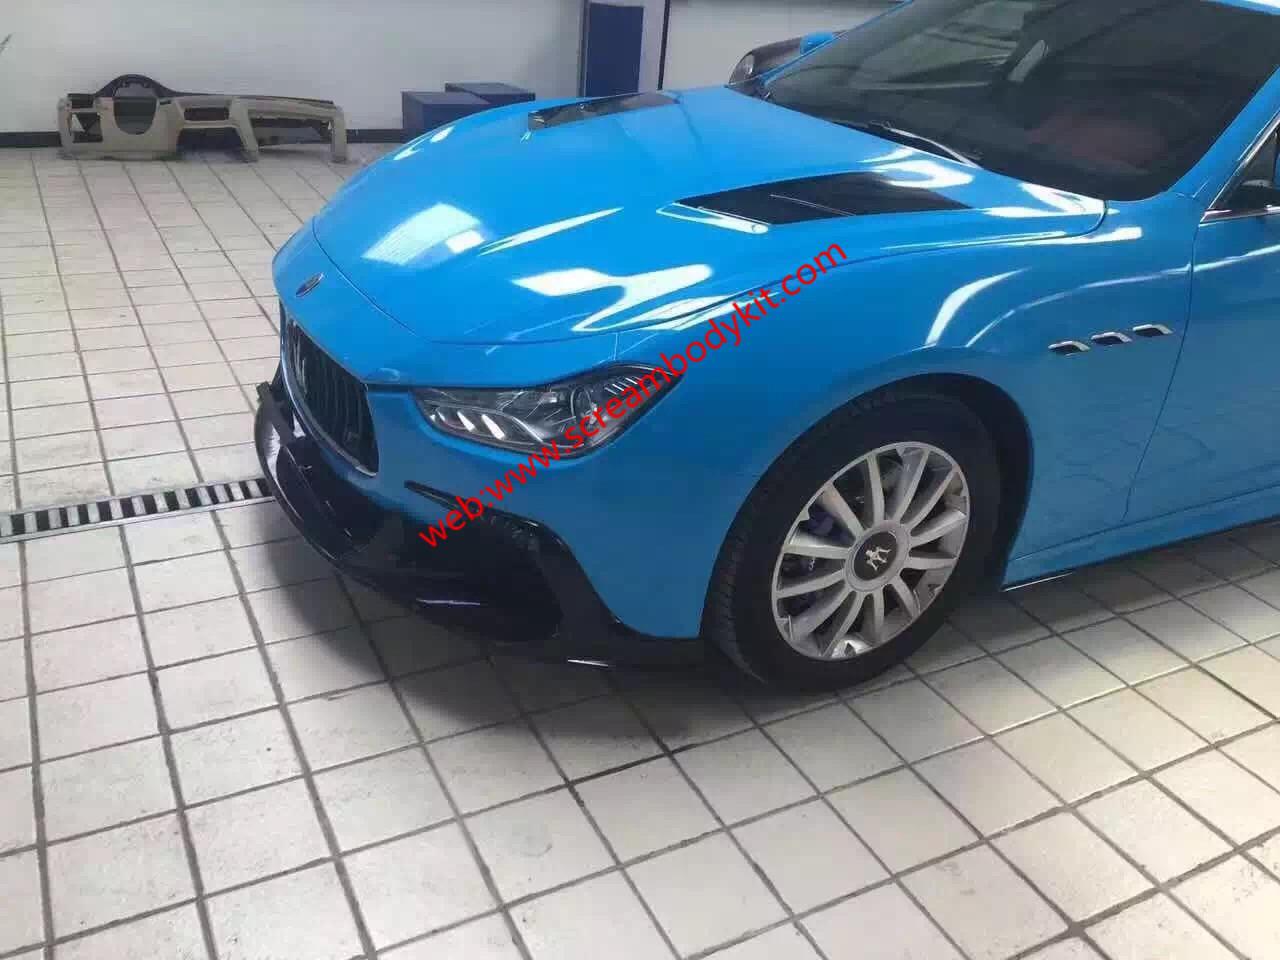 Maserati Ghibli body kit ASPEC front lip after lip side skirts wing